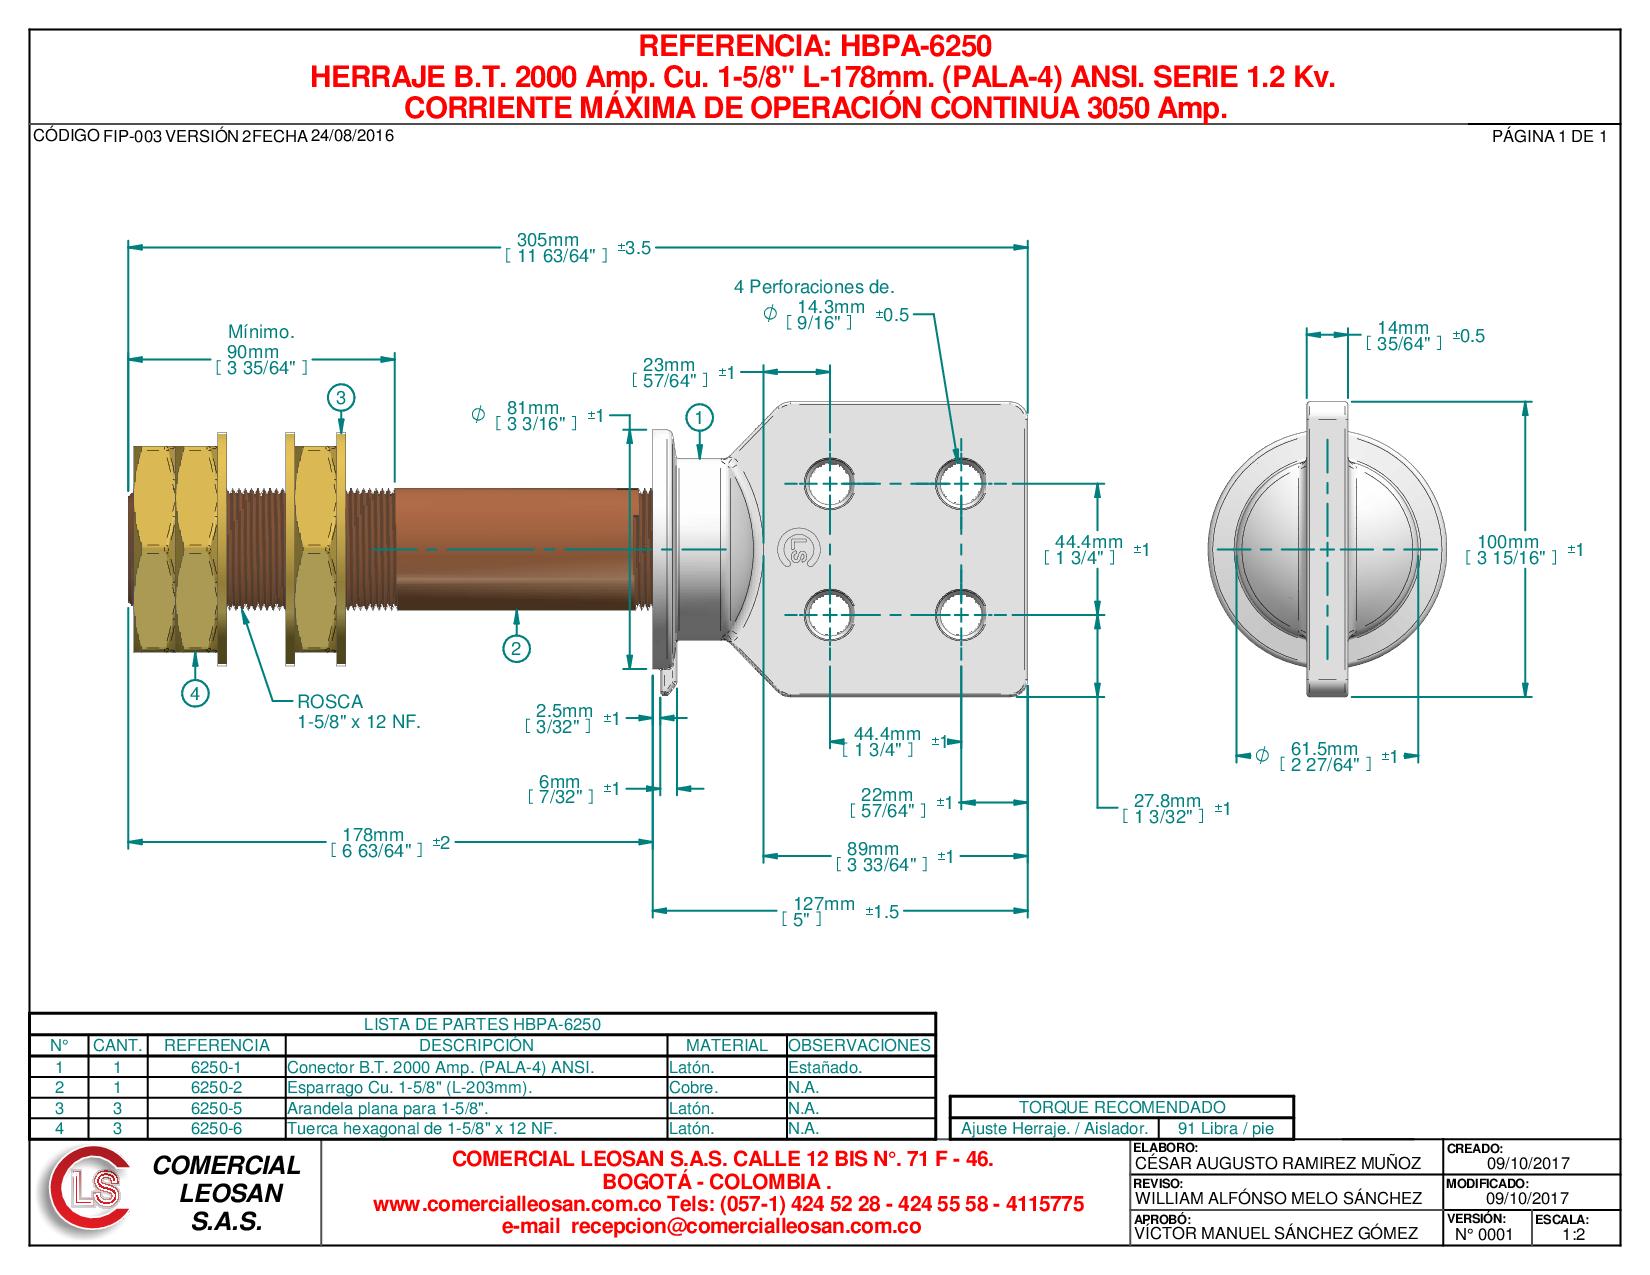 "HERRAJE B.T. 2000 Amp. Cu. 1-5/8"" L-178mm. (PALA-4) ANSI. SERIE 1.2 Kv."